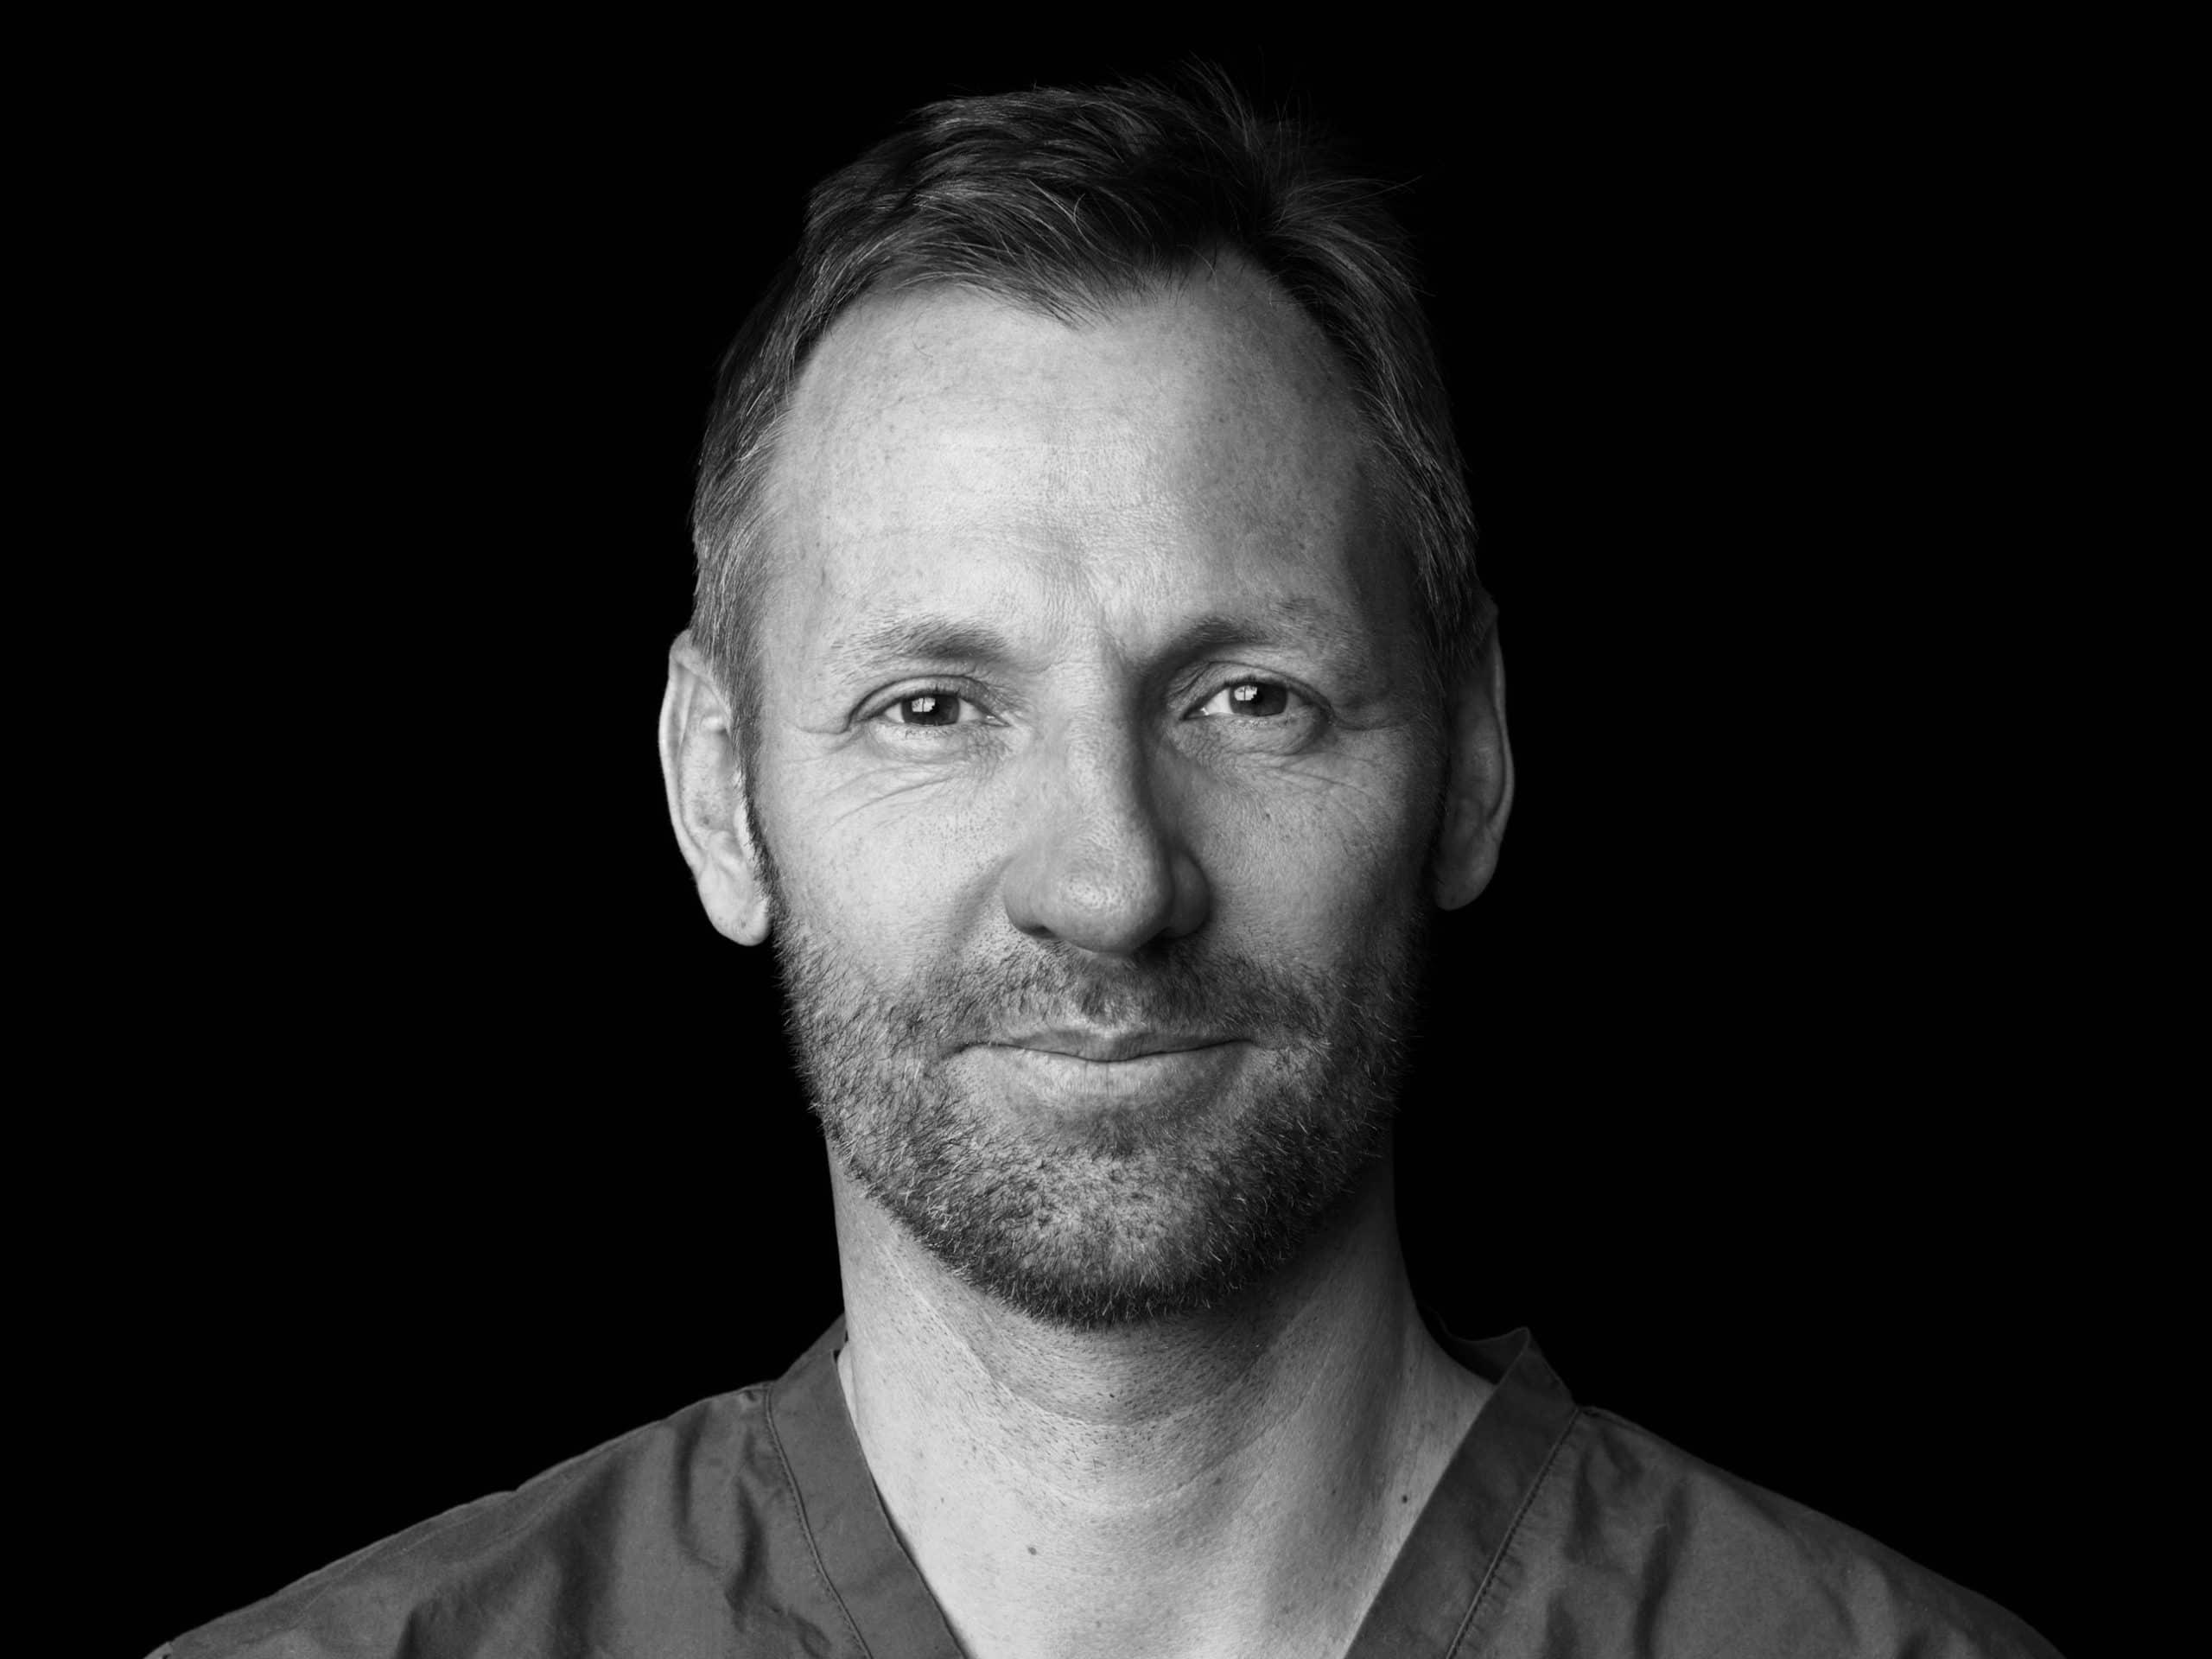 Niels Ulrich Hermund